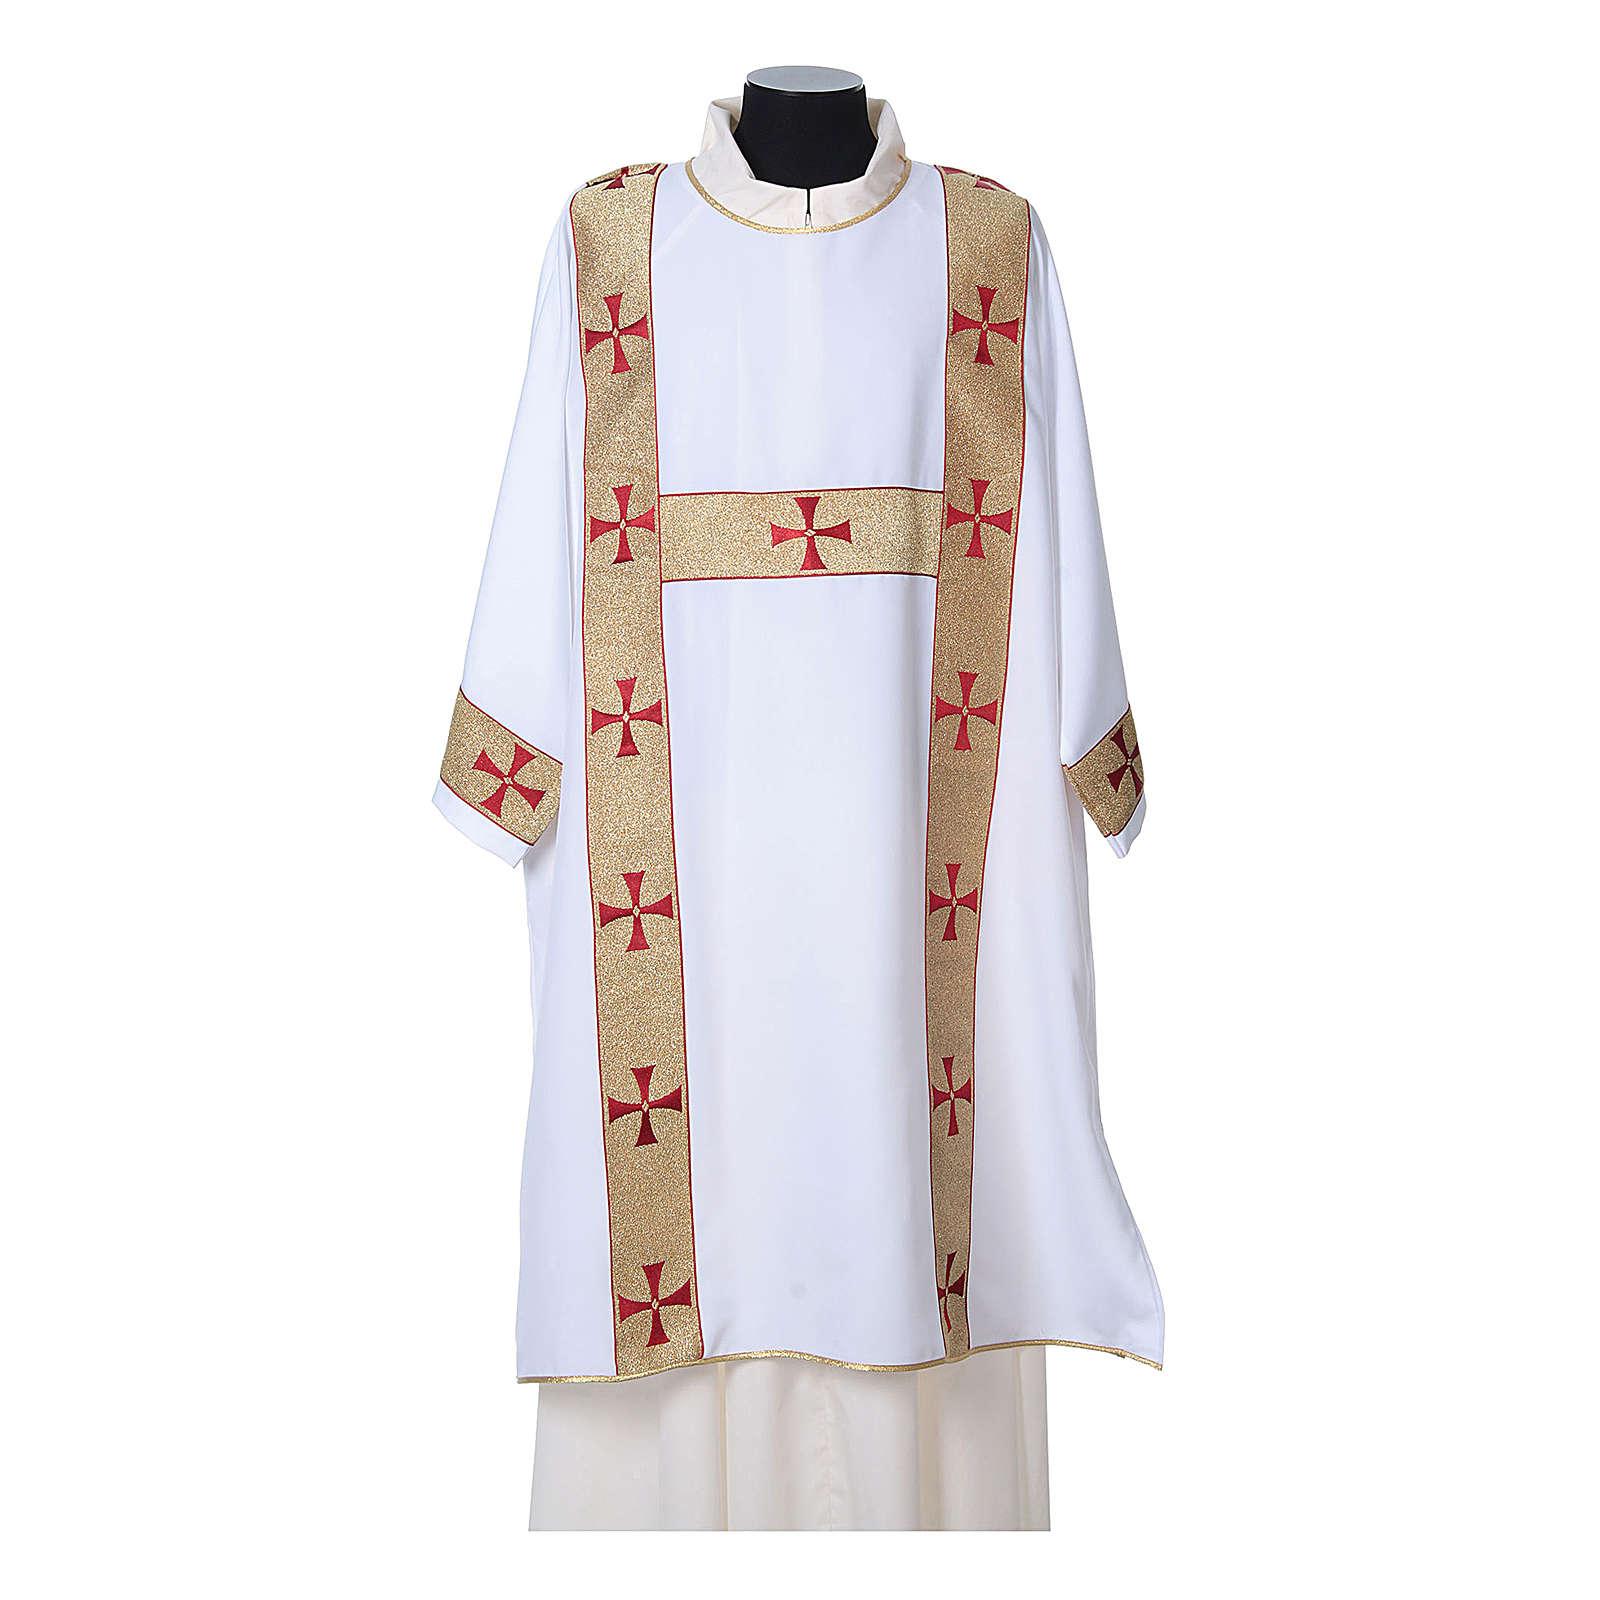 Dalmática tejido 100% poliéster Vatican entorchado aplicado parte anterior 4